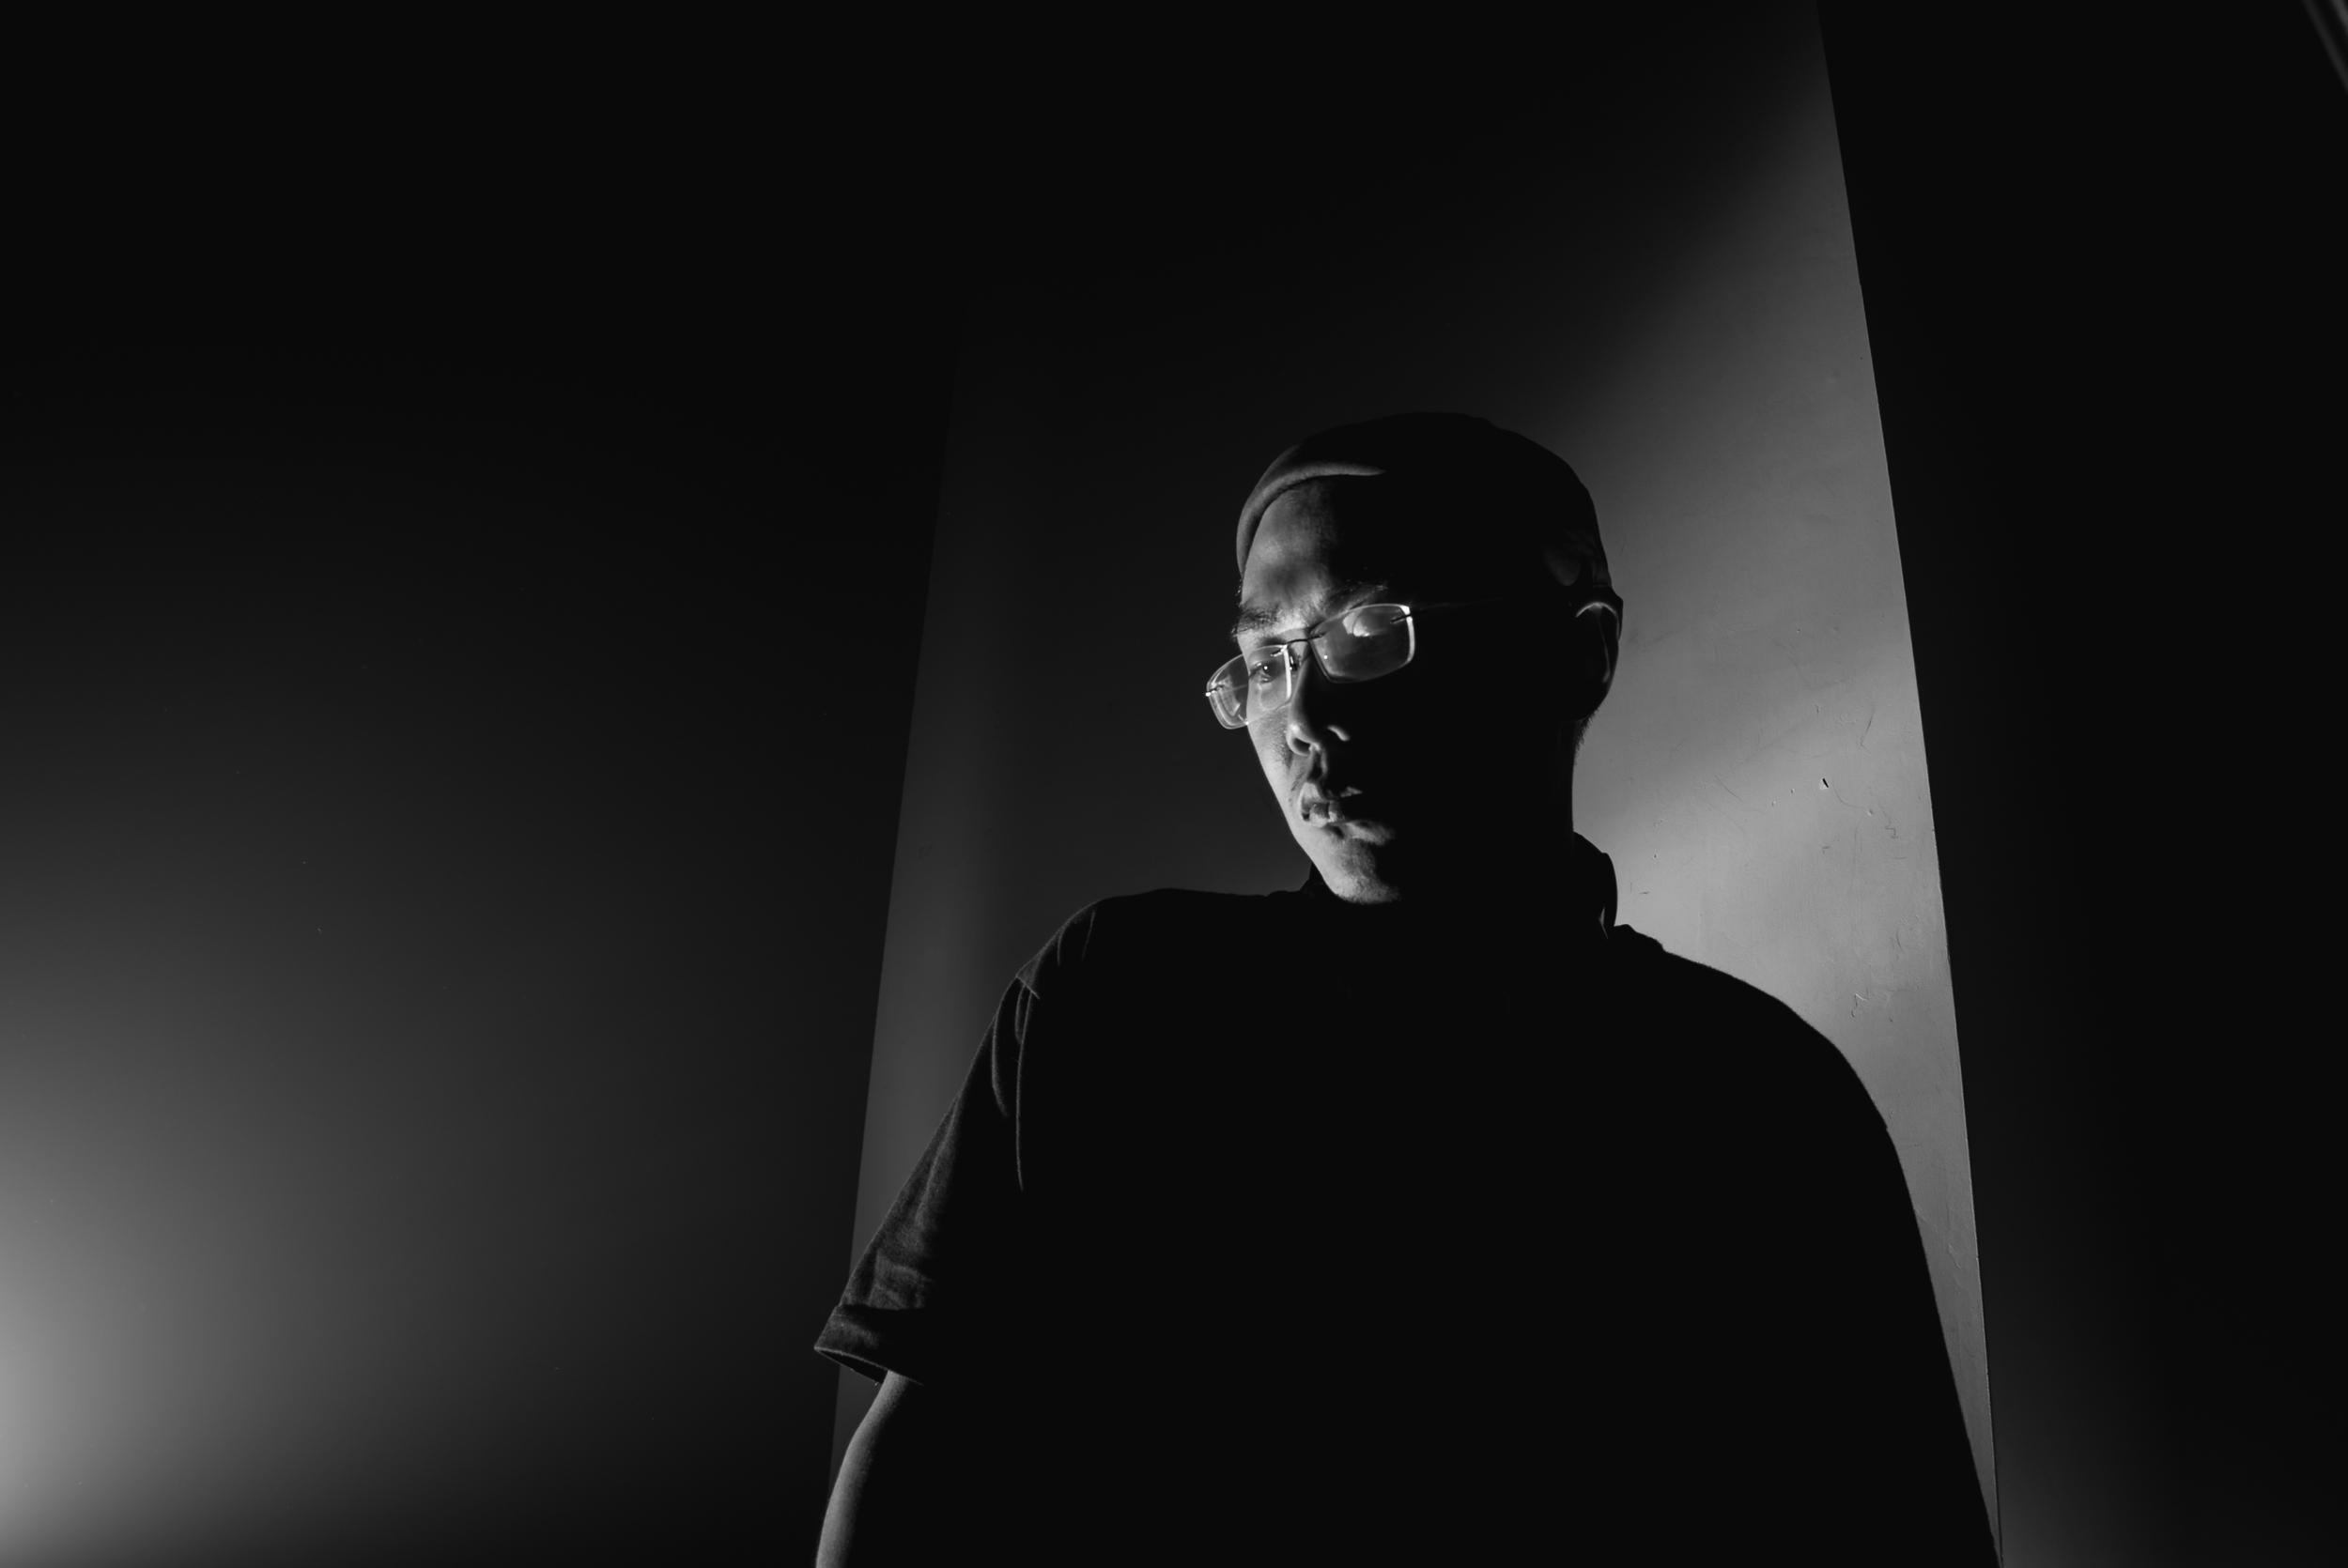 Photo credit : Axel Serik